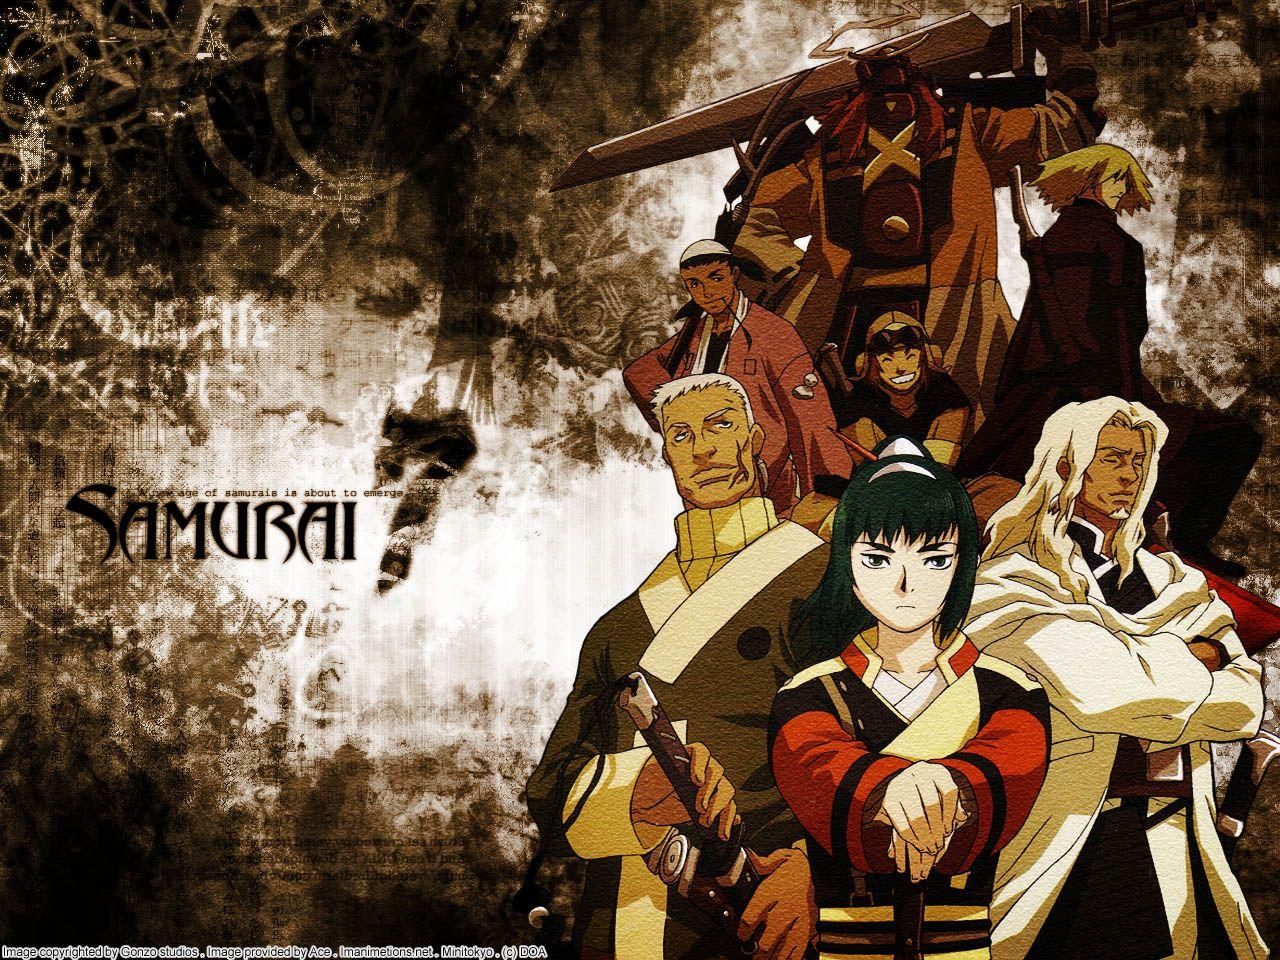 Samurai 7. Kyuzo is my favorite. Awesome anime, Anime shows